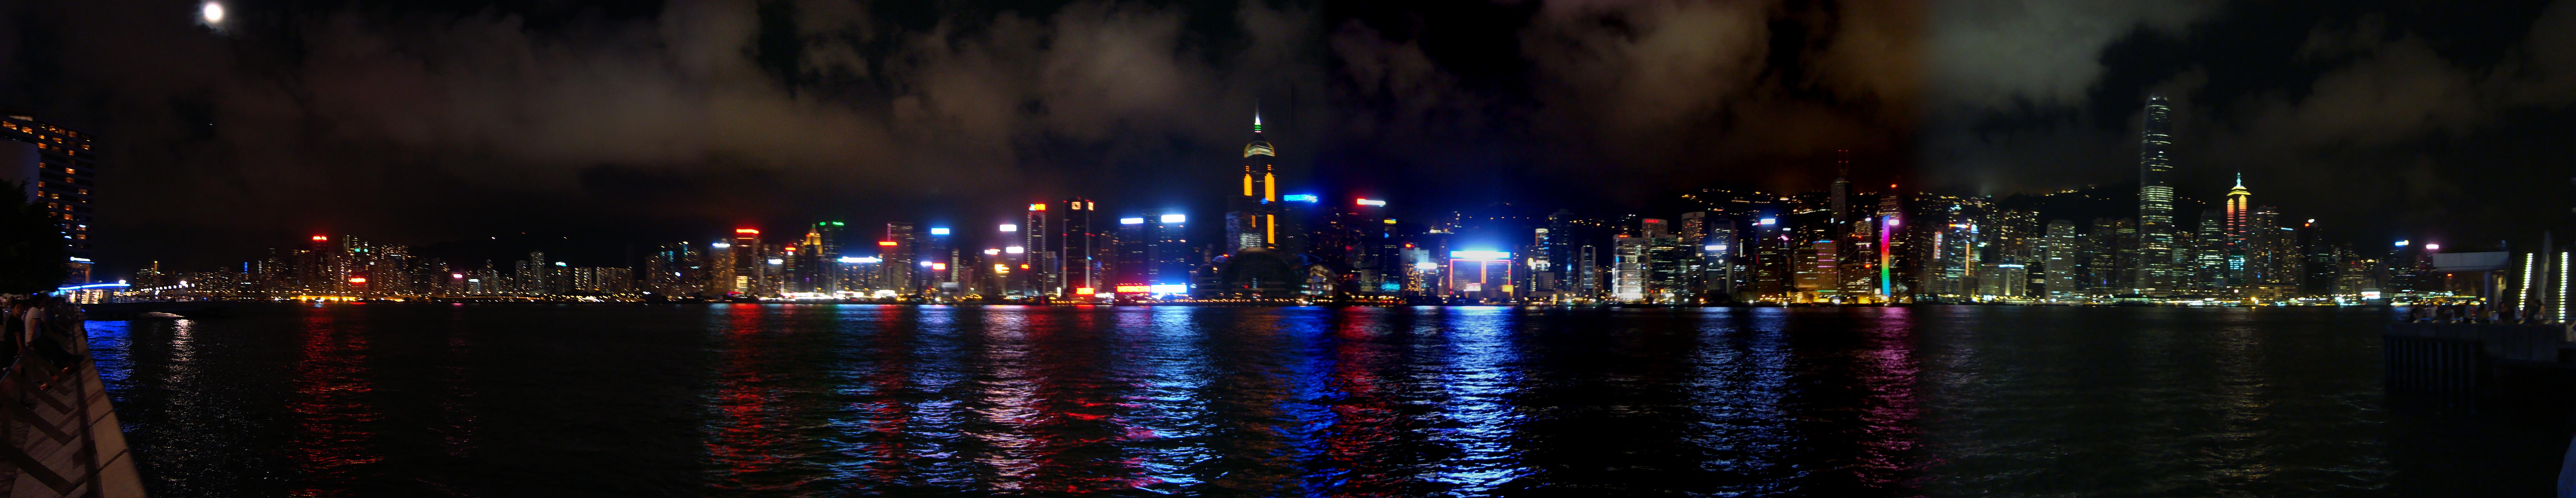 The panoramic night view of